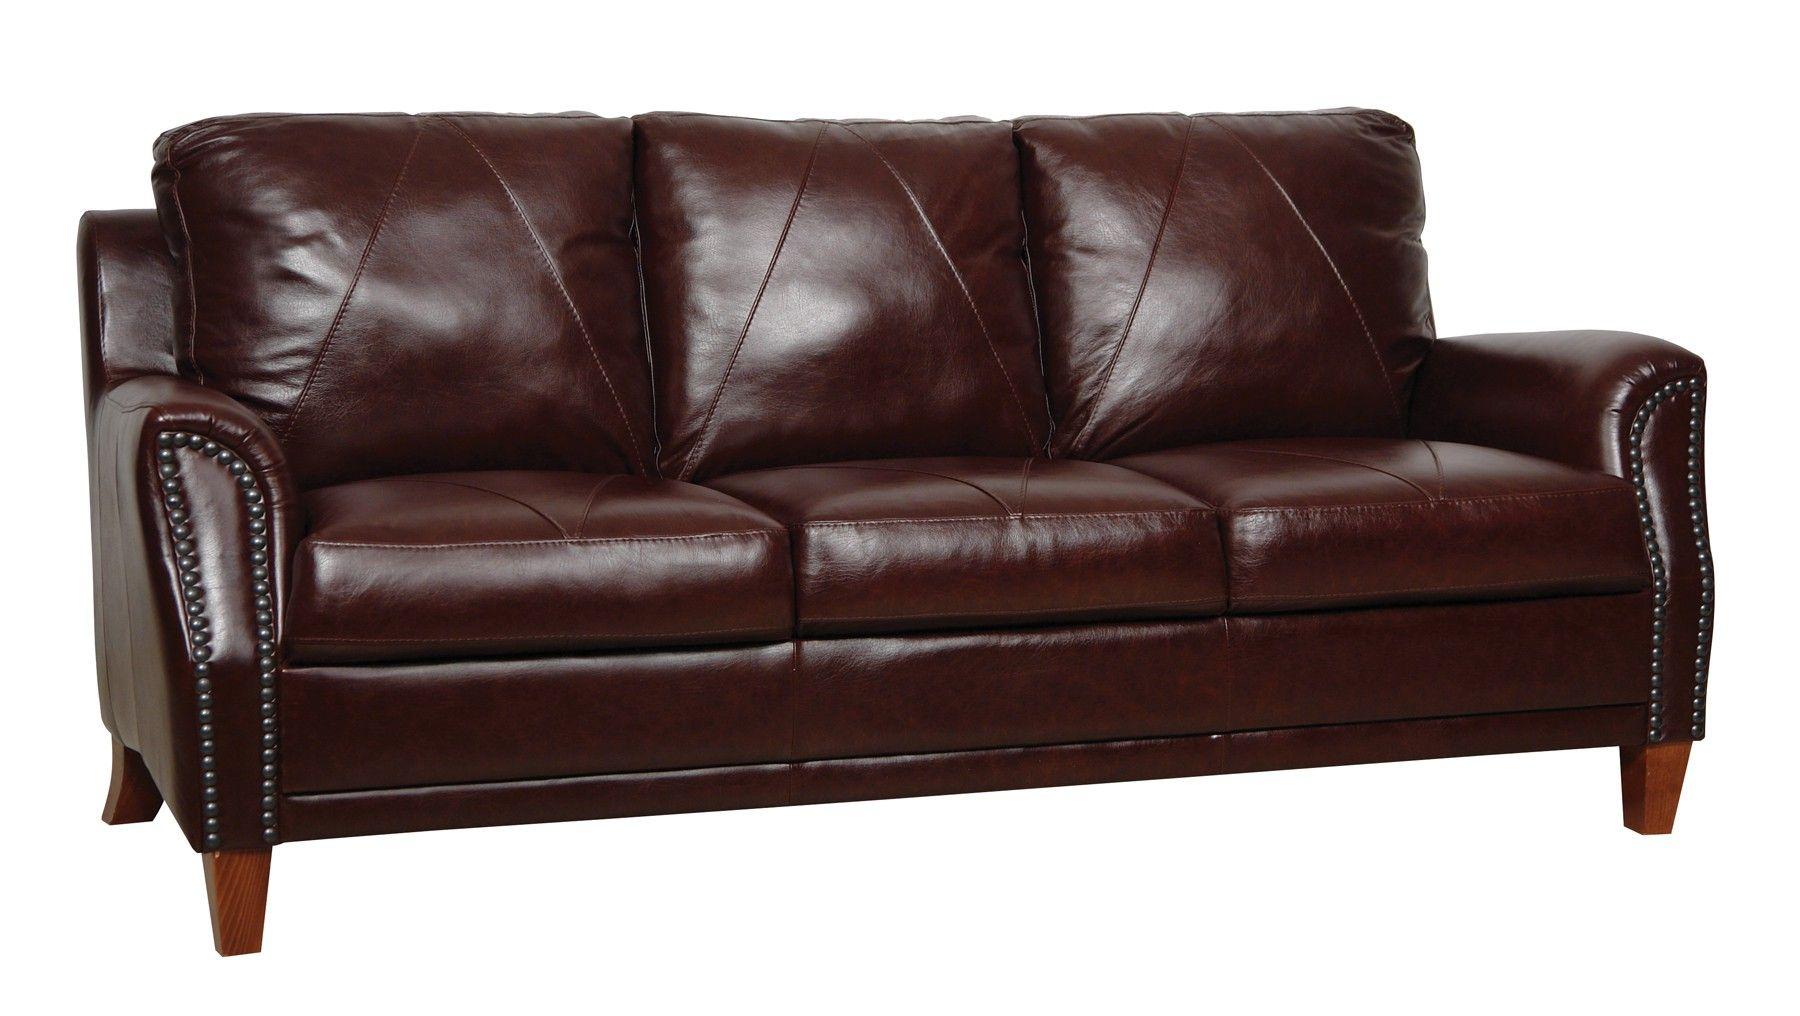 Austin Italian Leather Sofa Black Brown And Burgundy Distressing Lukeleather Leather Modular Sofa Italian Leather Sofa Leather Sofa